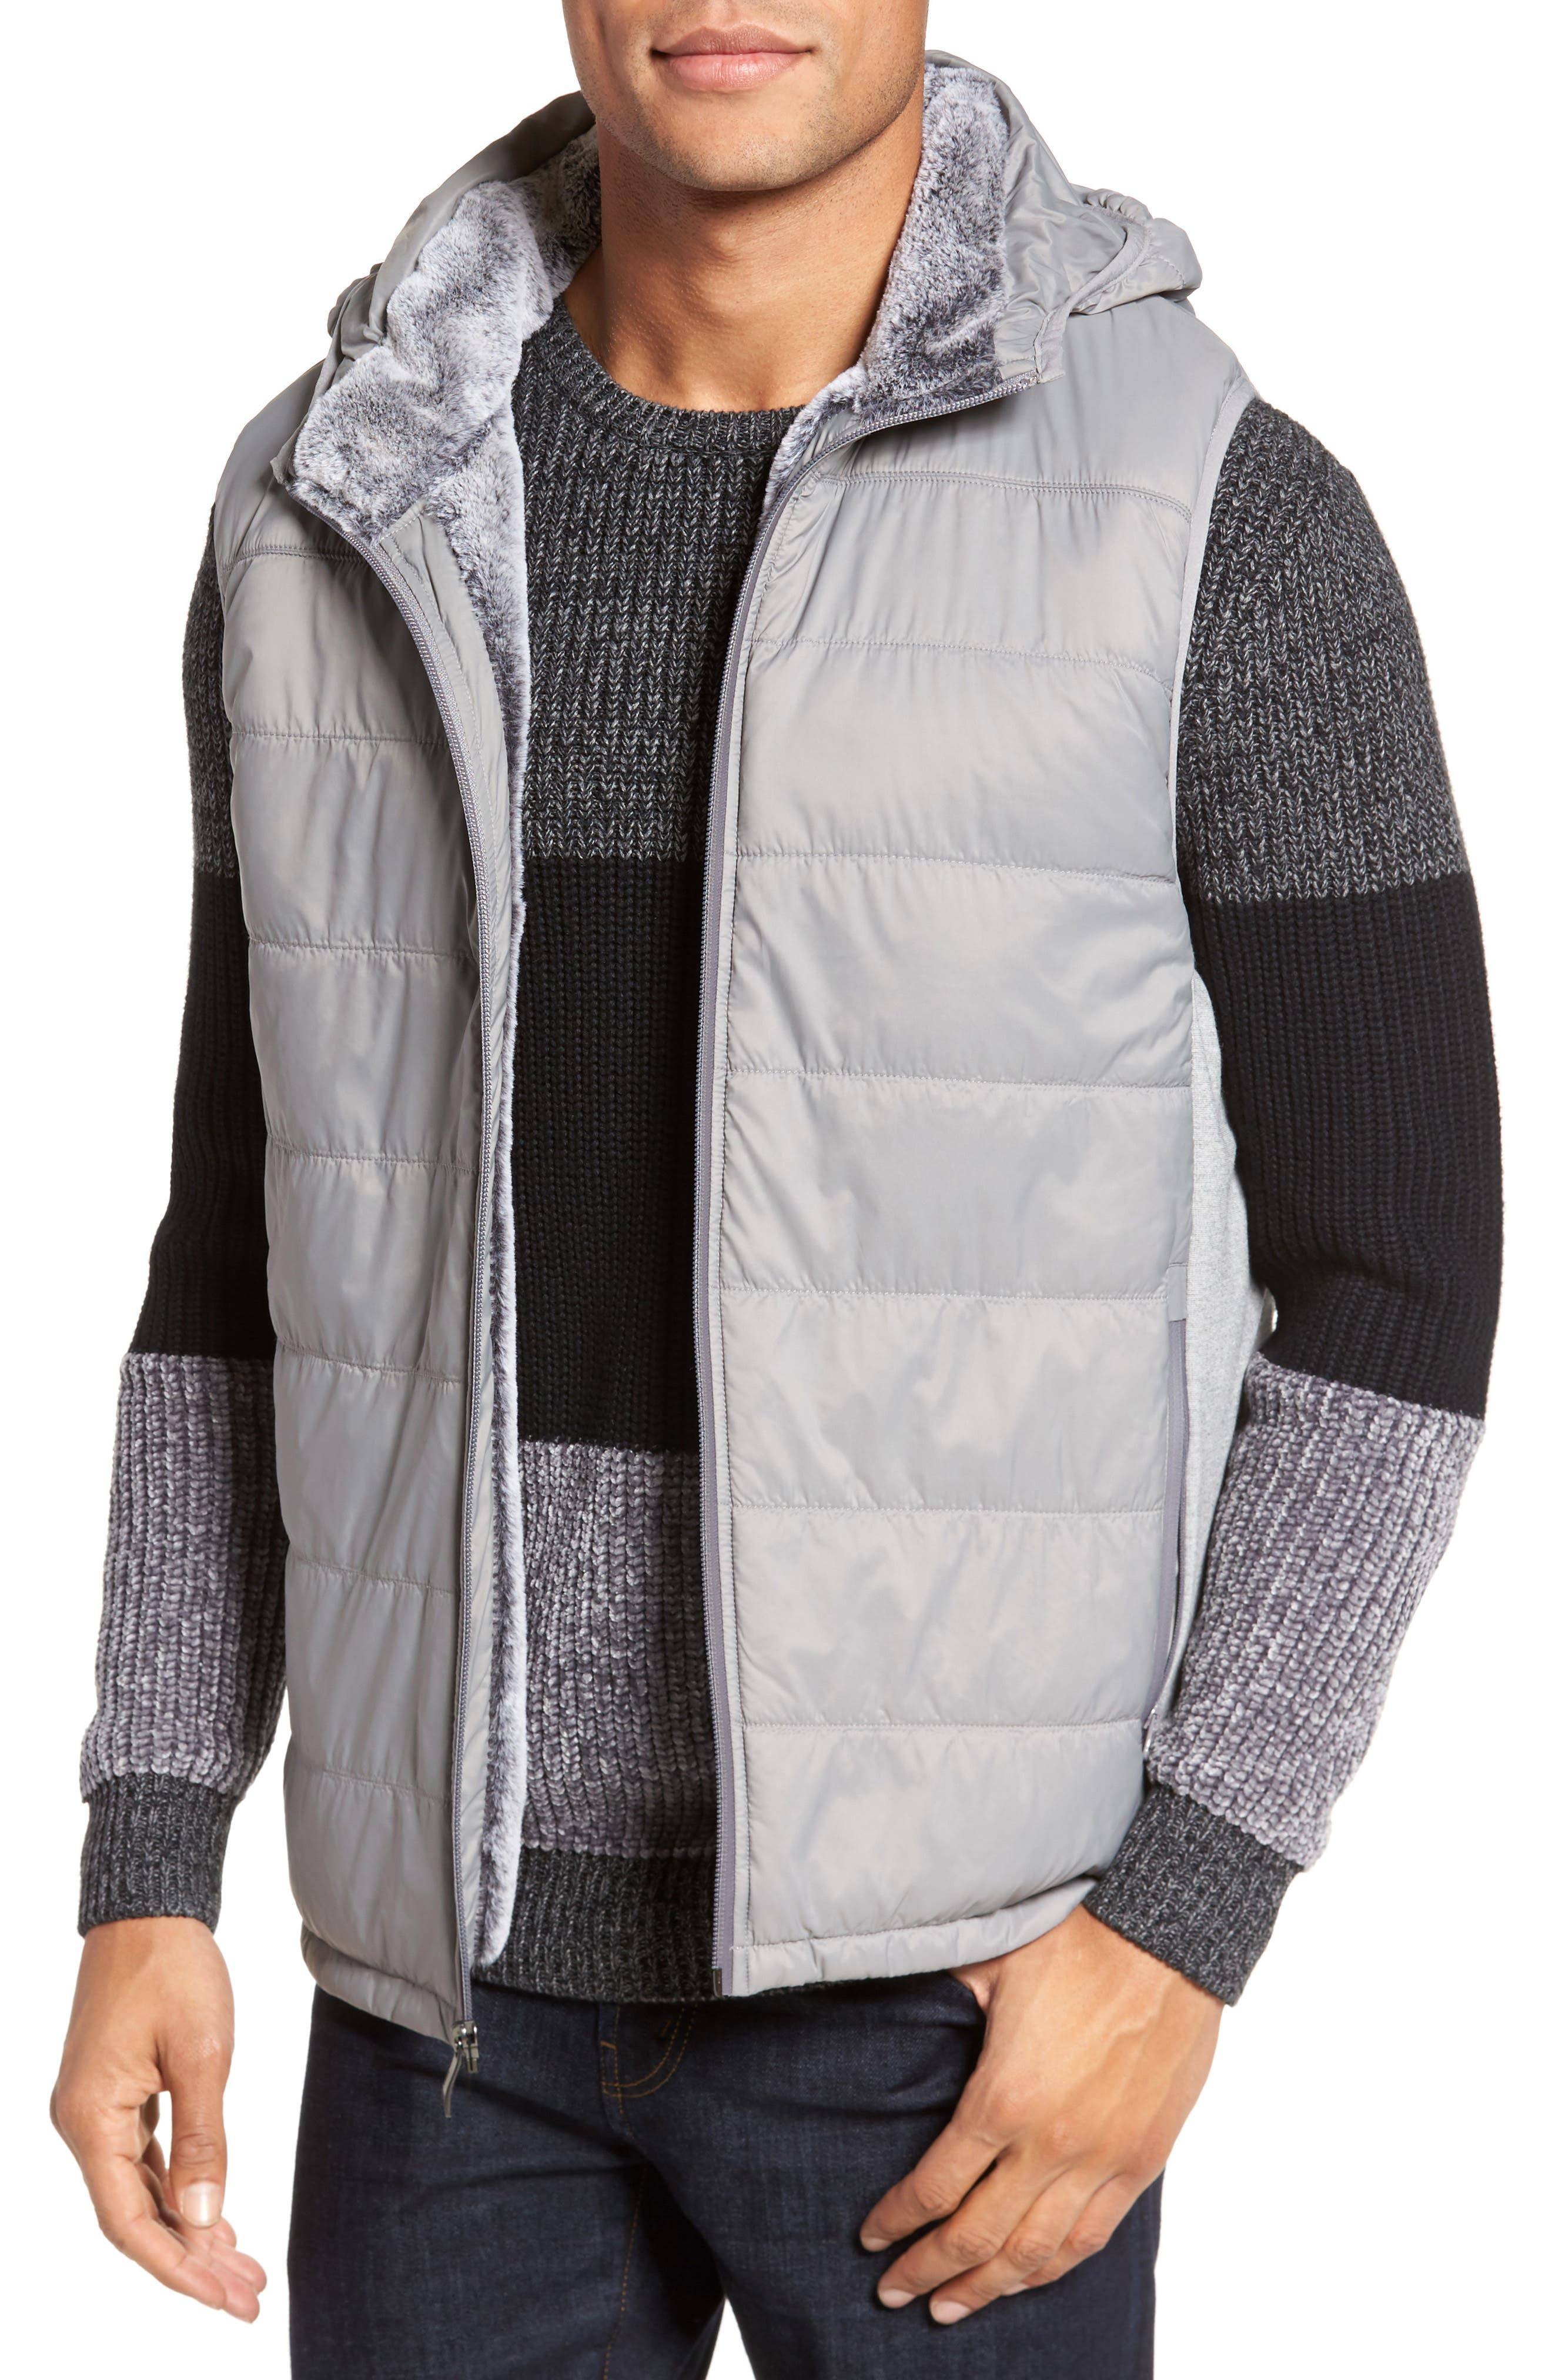 Vince Camuto Hooded Vest